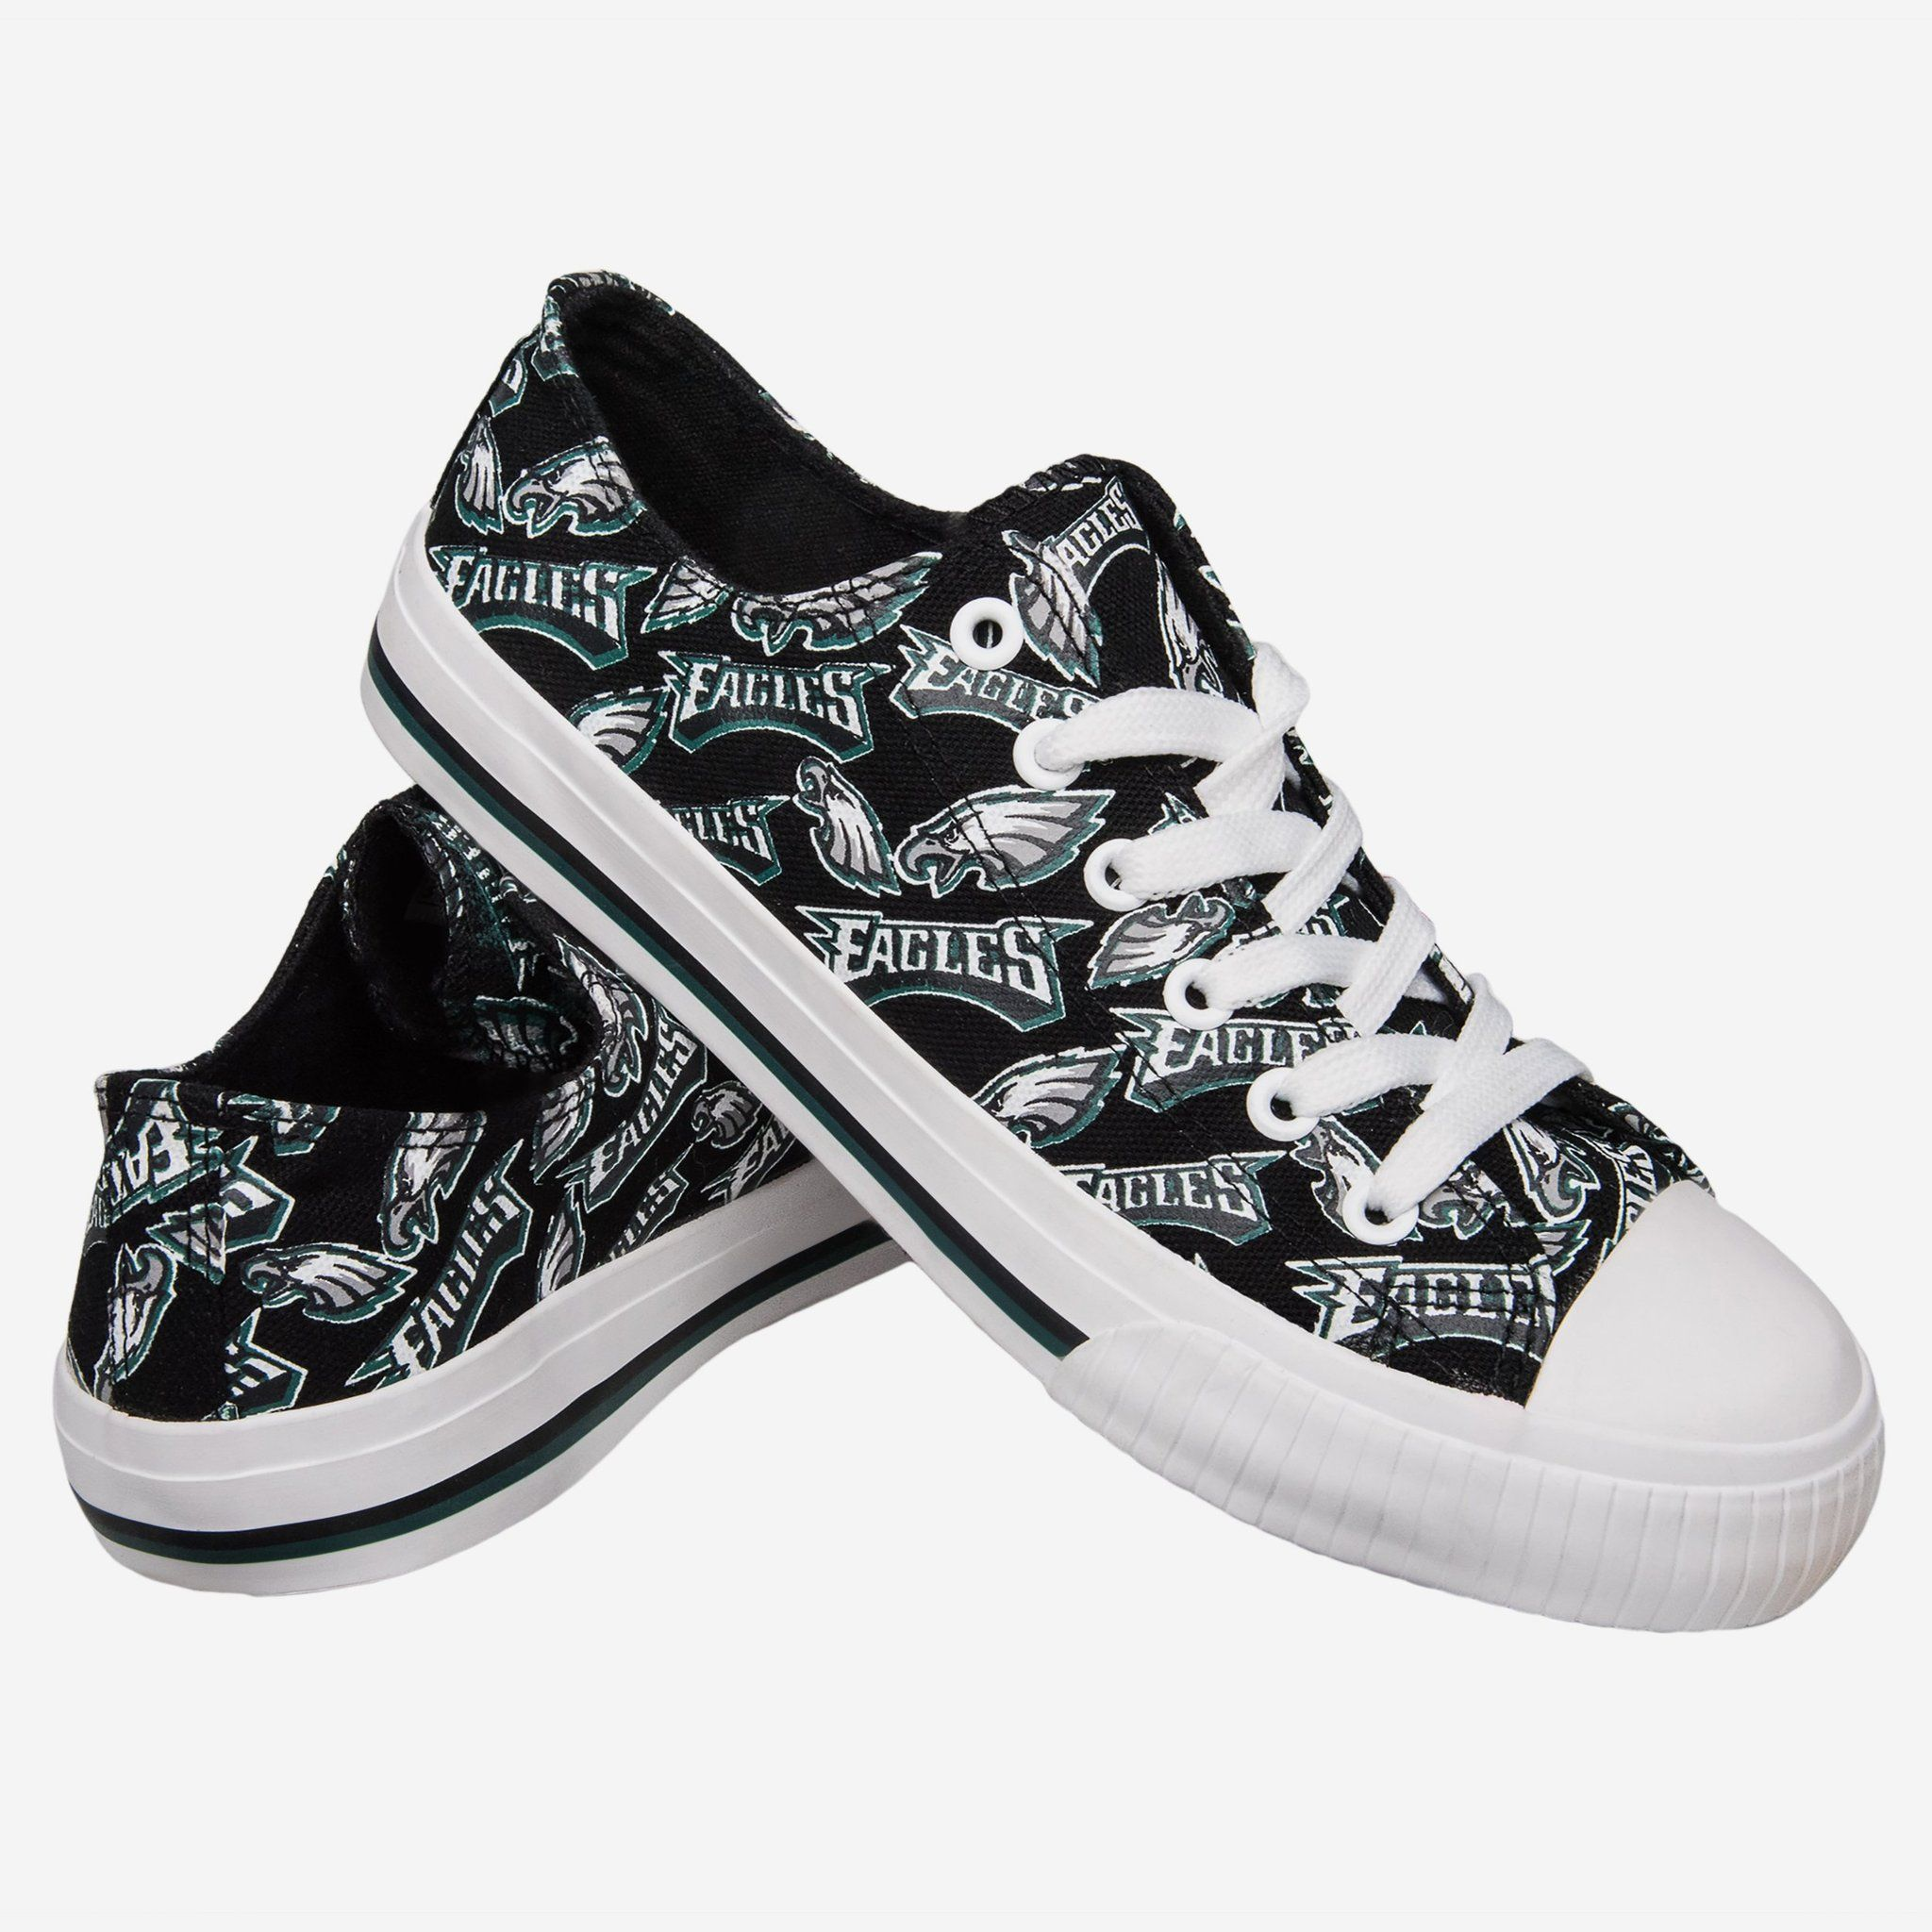 6f6f99b8 Philadelphia Eagles Womens Low Top Repeat Print Canvas Shoe | Yes I ...